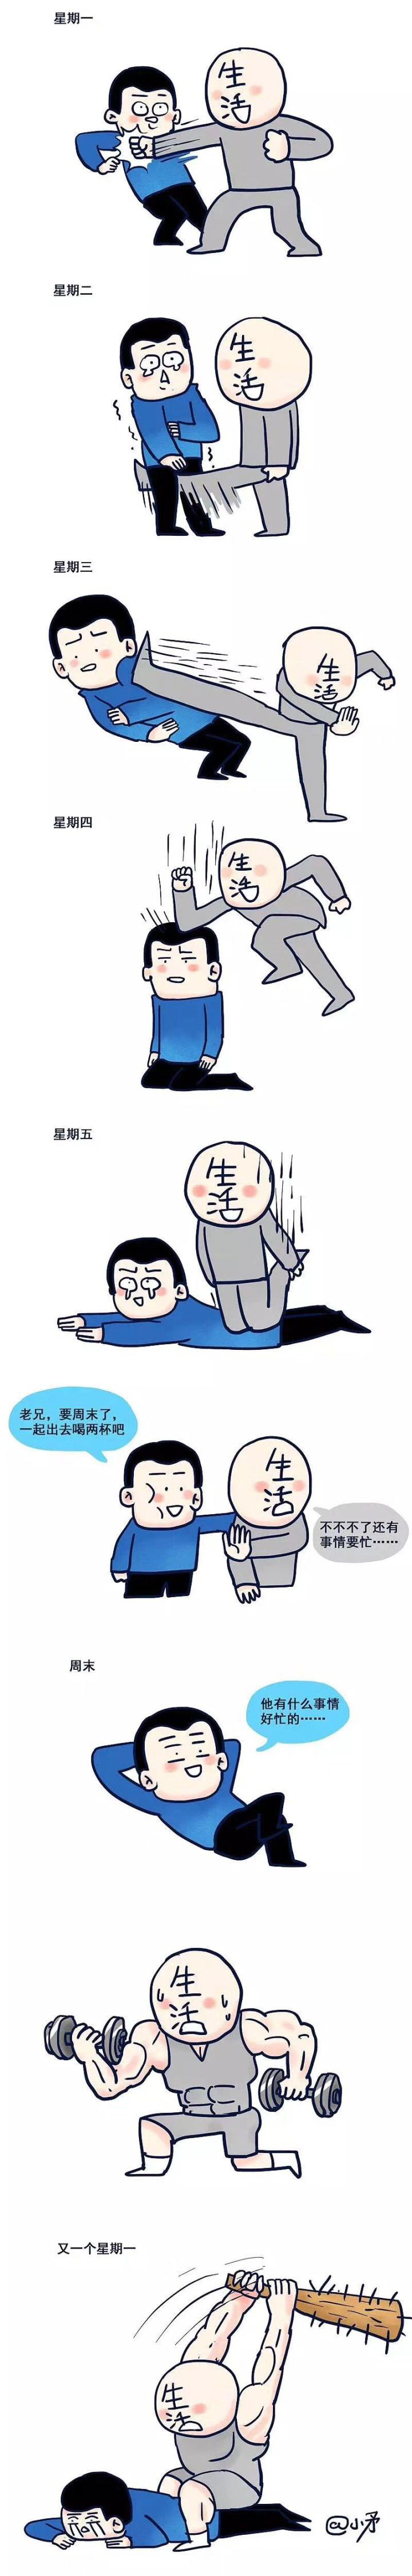 https://jooger-static.oss-cn-beijing.aliyuncs.com/img/source/20181007/Life-is-struggle_1538916450696.jpg